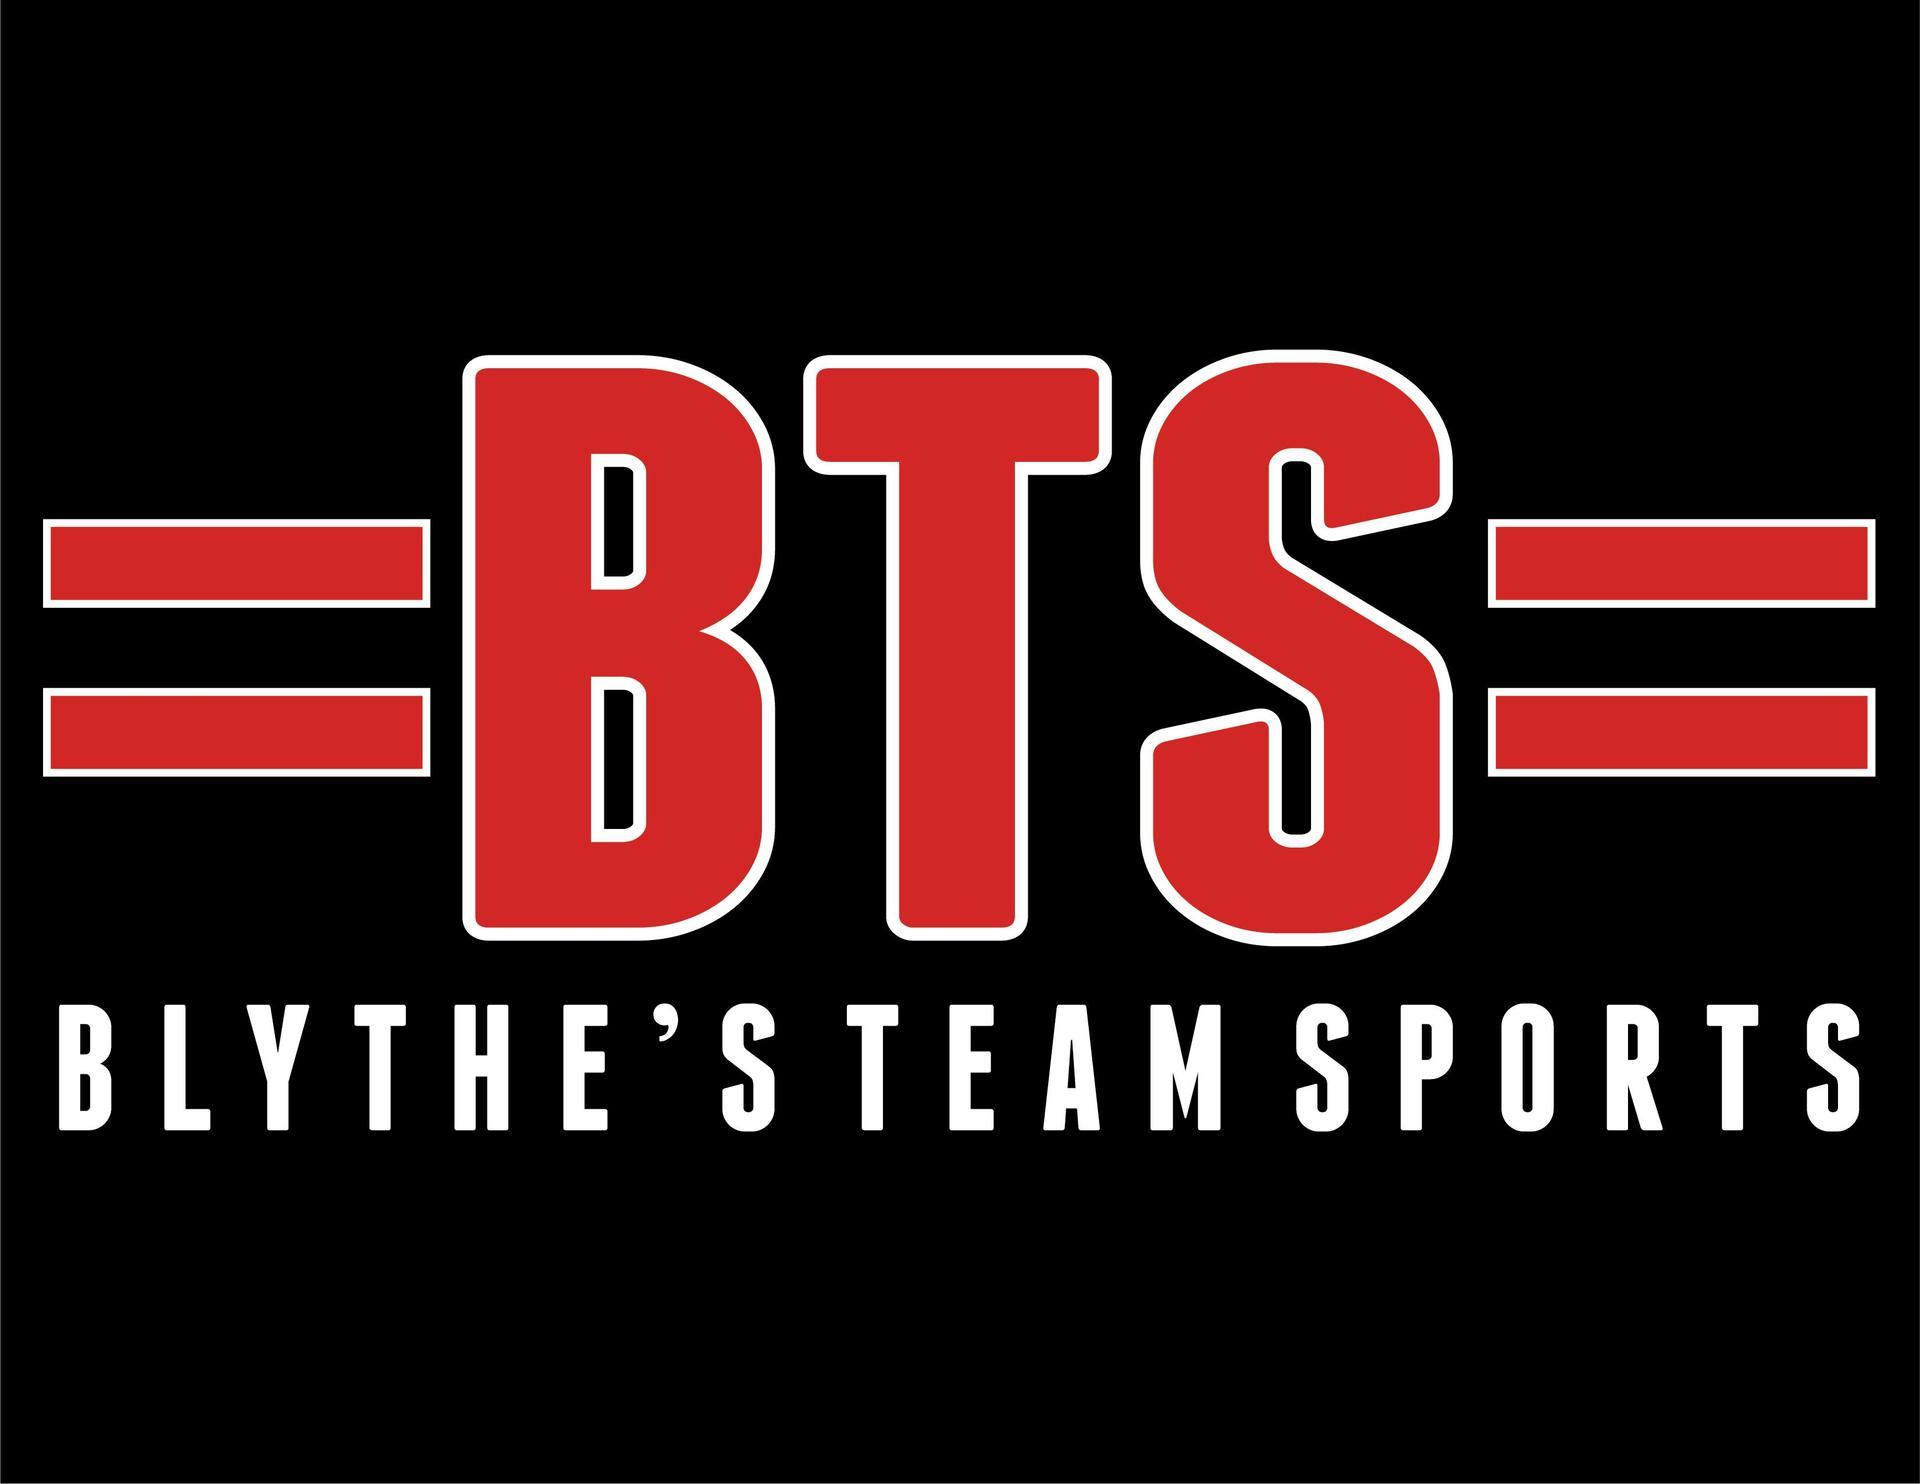 Blythe's